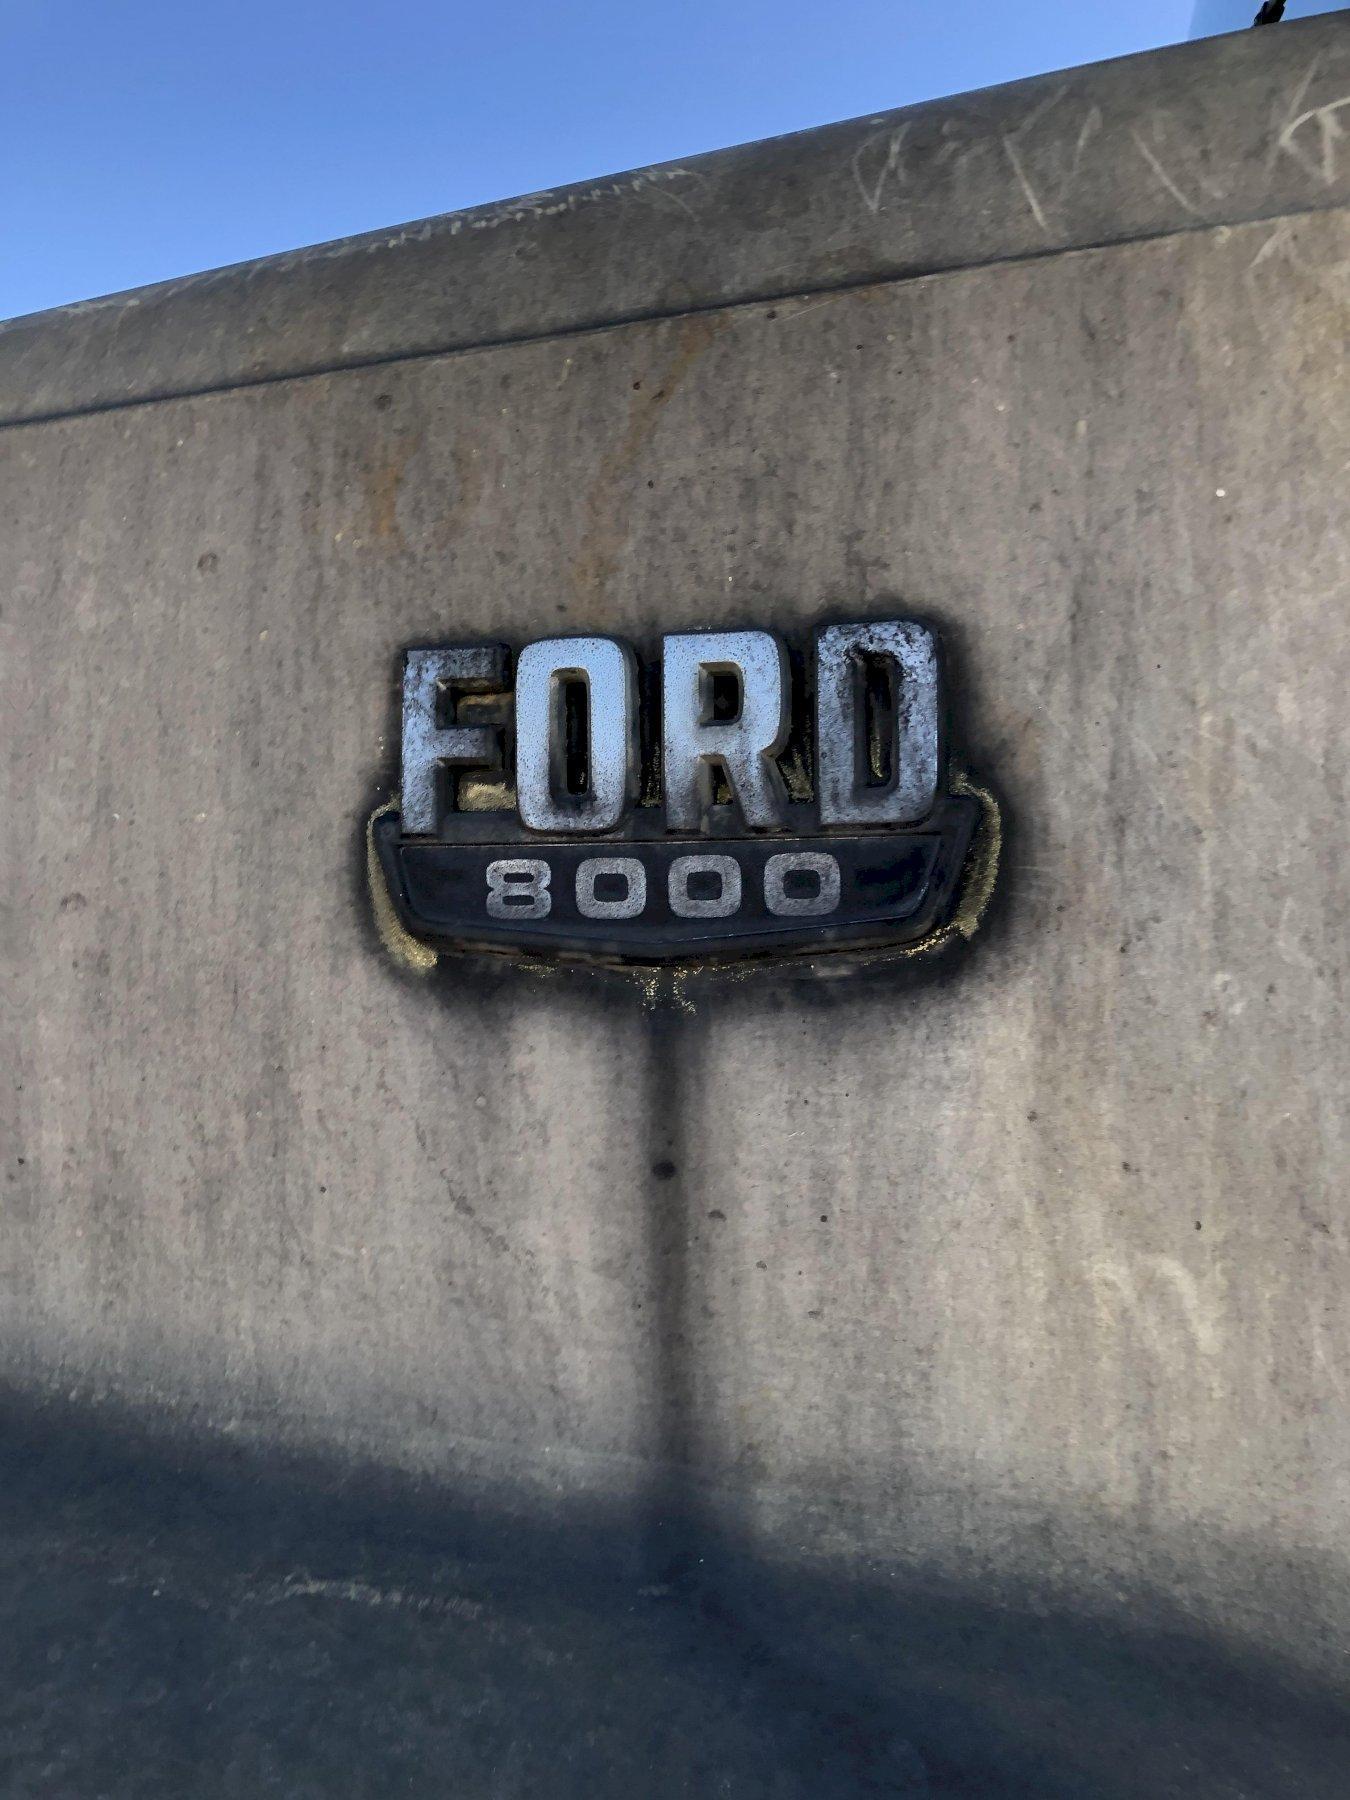 Ford 8000 diesel powered dump truck vin# 1fdyu8002fva58059 with 15' dump body, 77207 miles